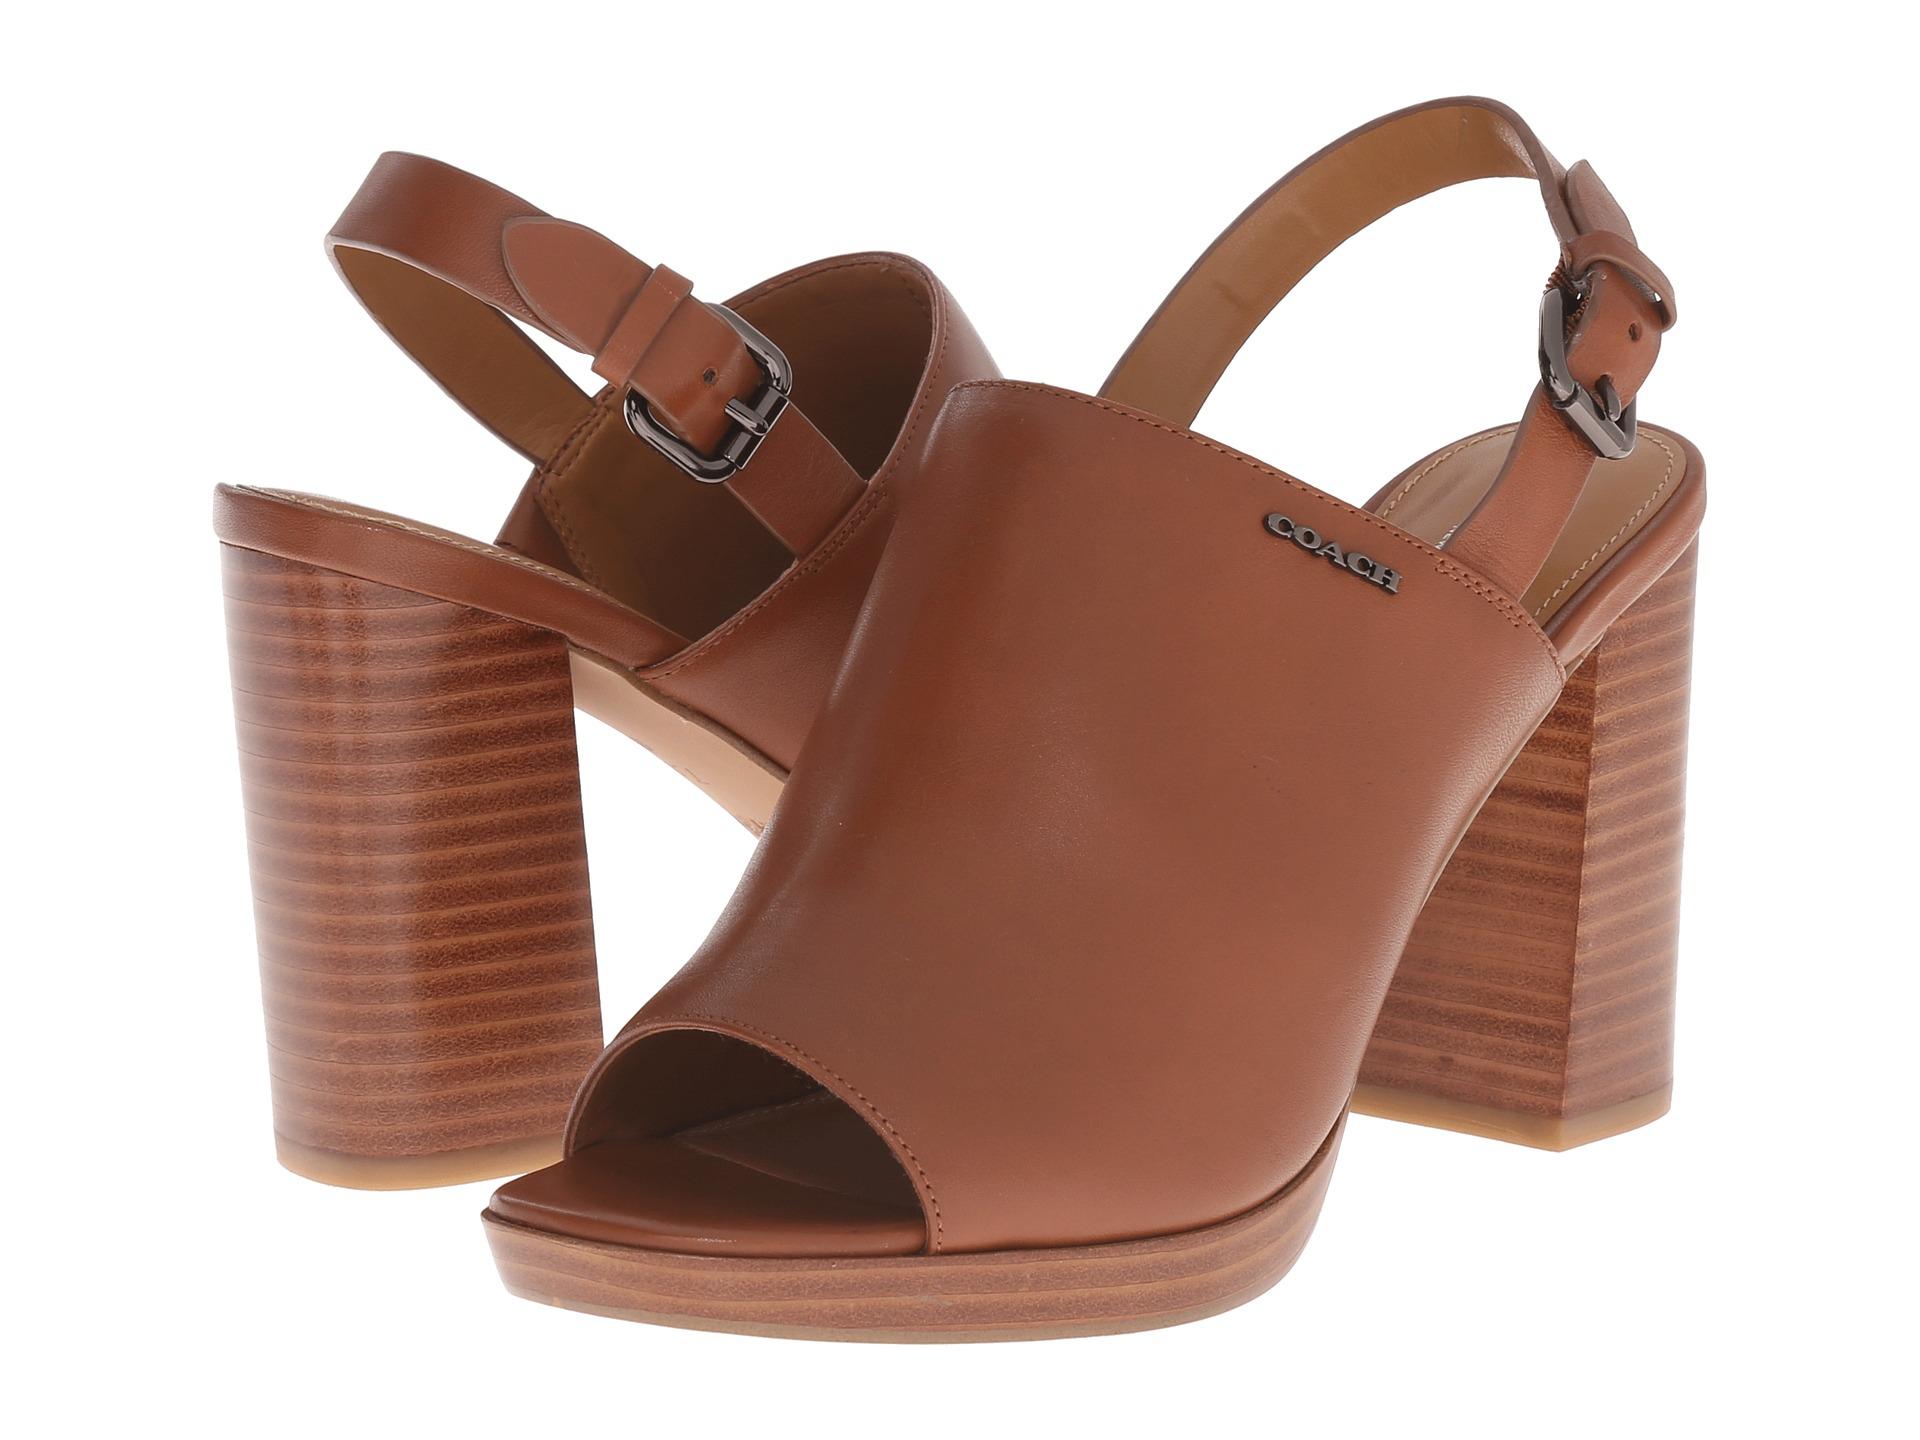 Womens Shoes COACH Brady Saddle Semi Matte Calf